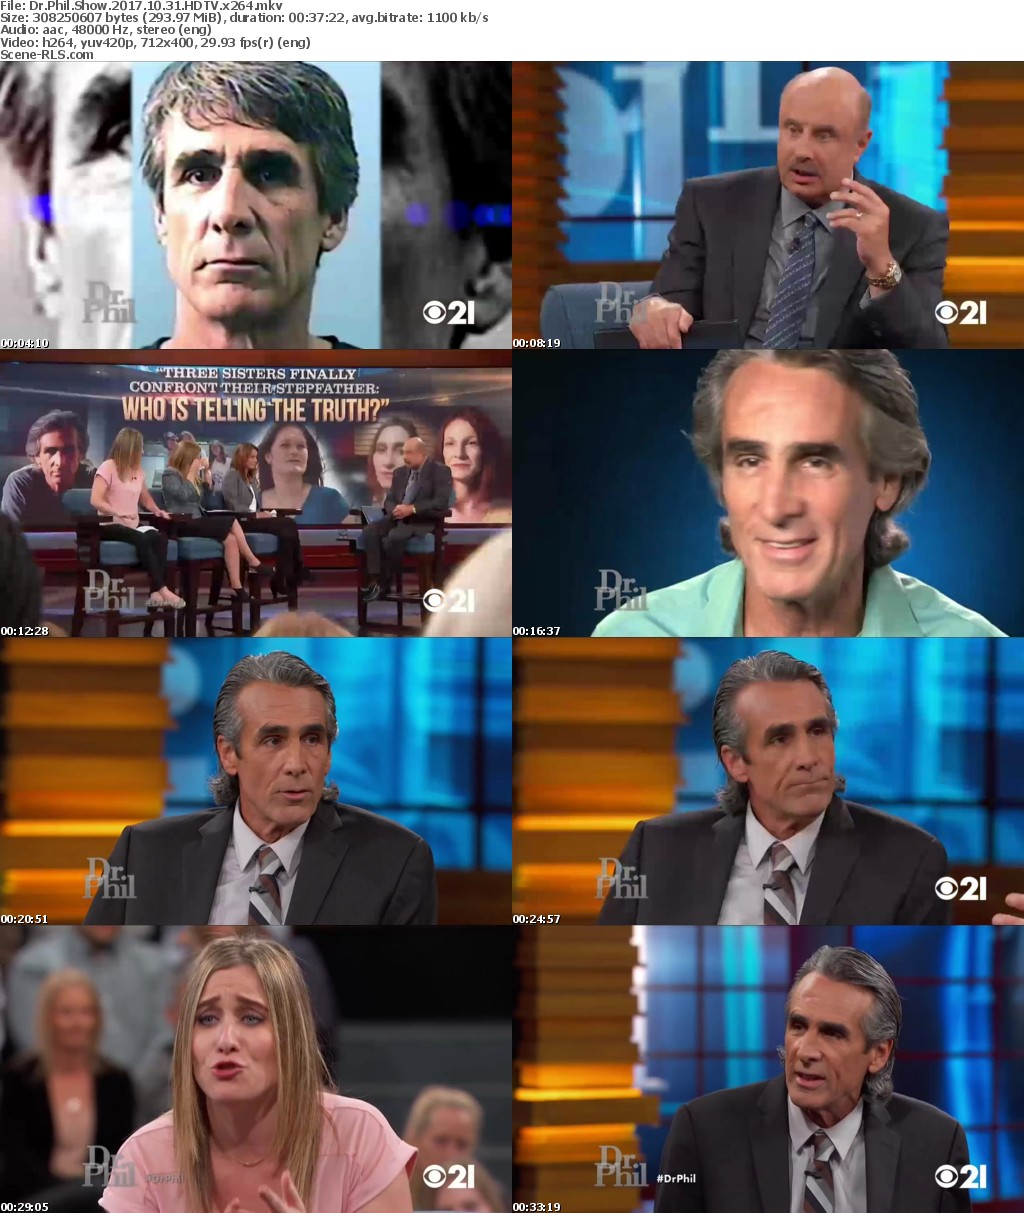 Dr Phil Show 2017 10 31 HDTV x264 - Scene Release